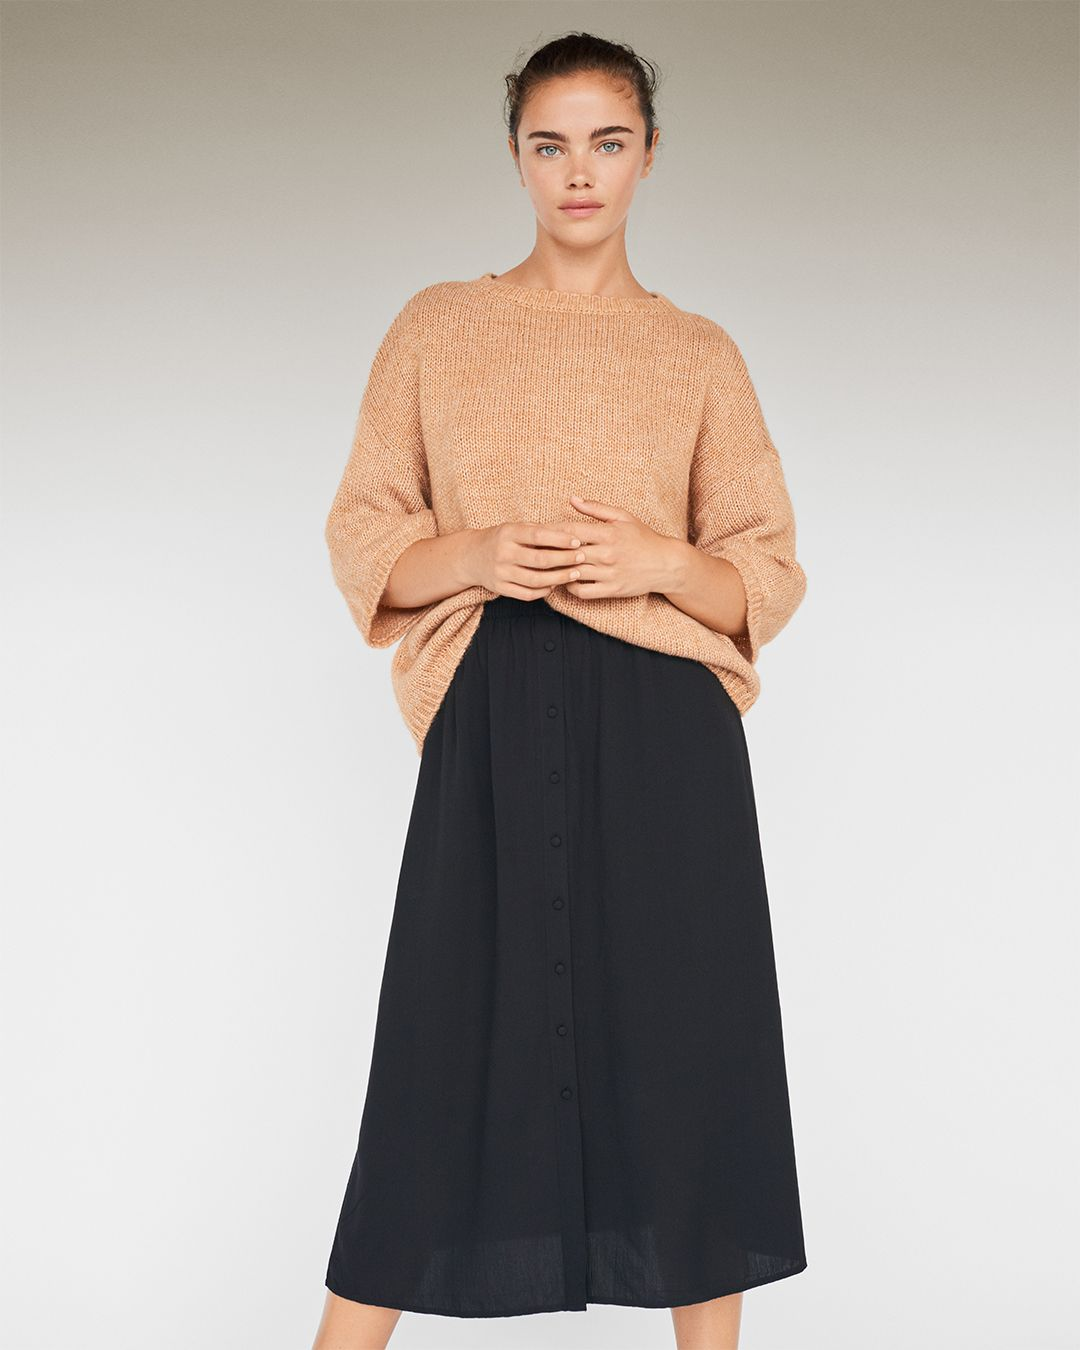 db3bb4f1 AWARE by VERO MODA - A more sustainable fashion choice | VERO MODA ...